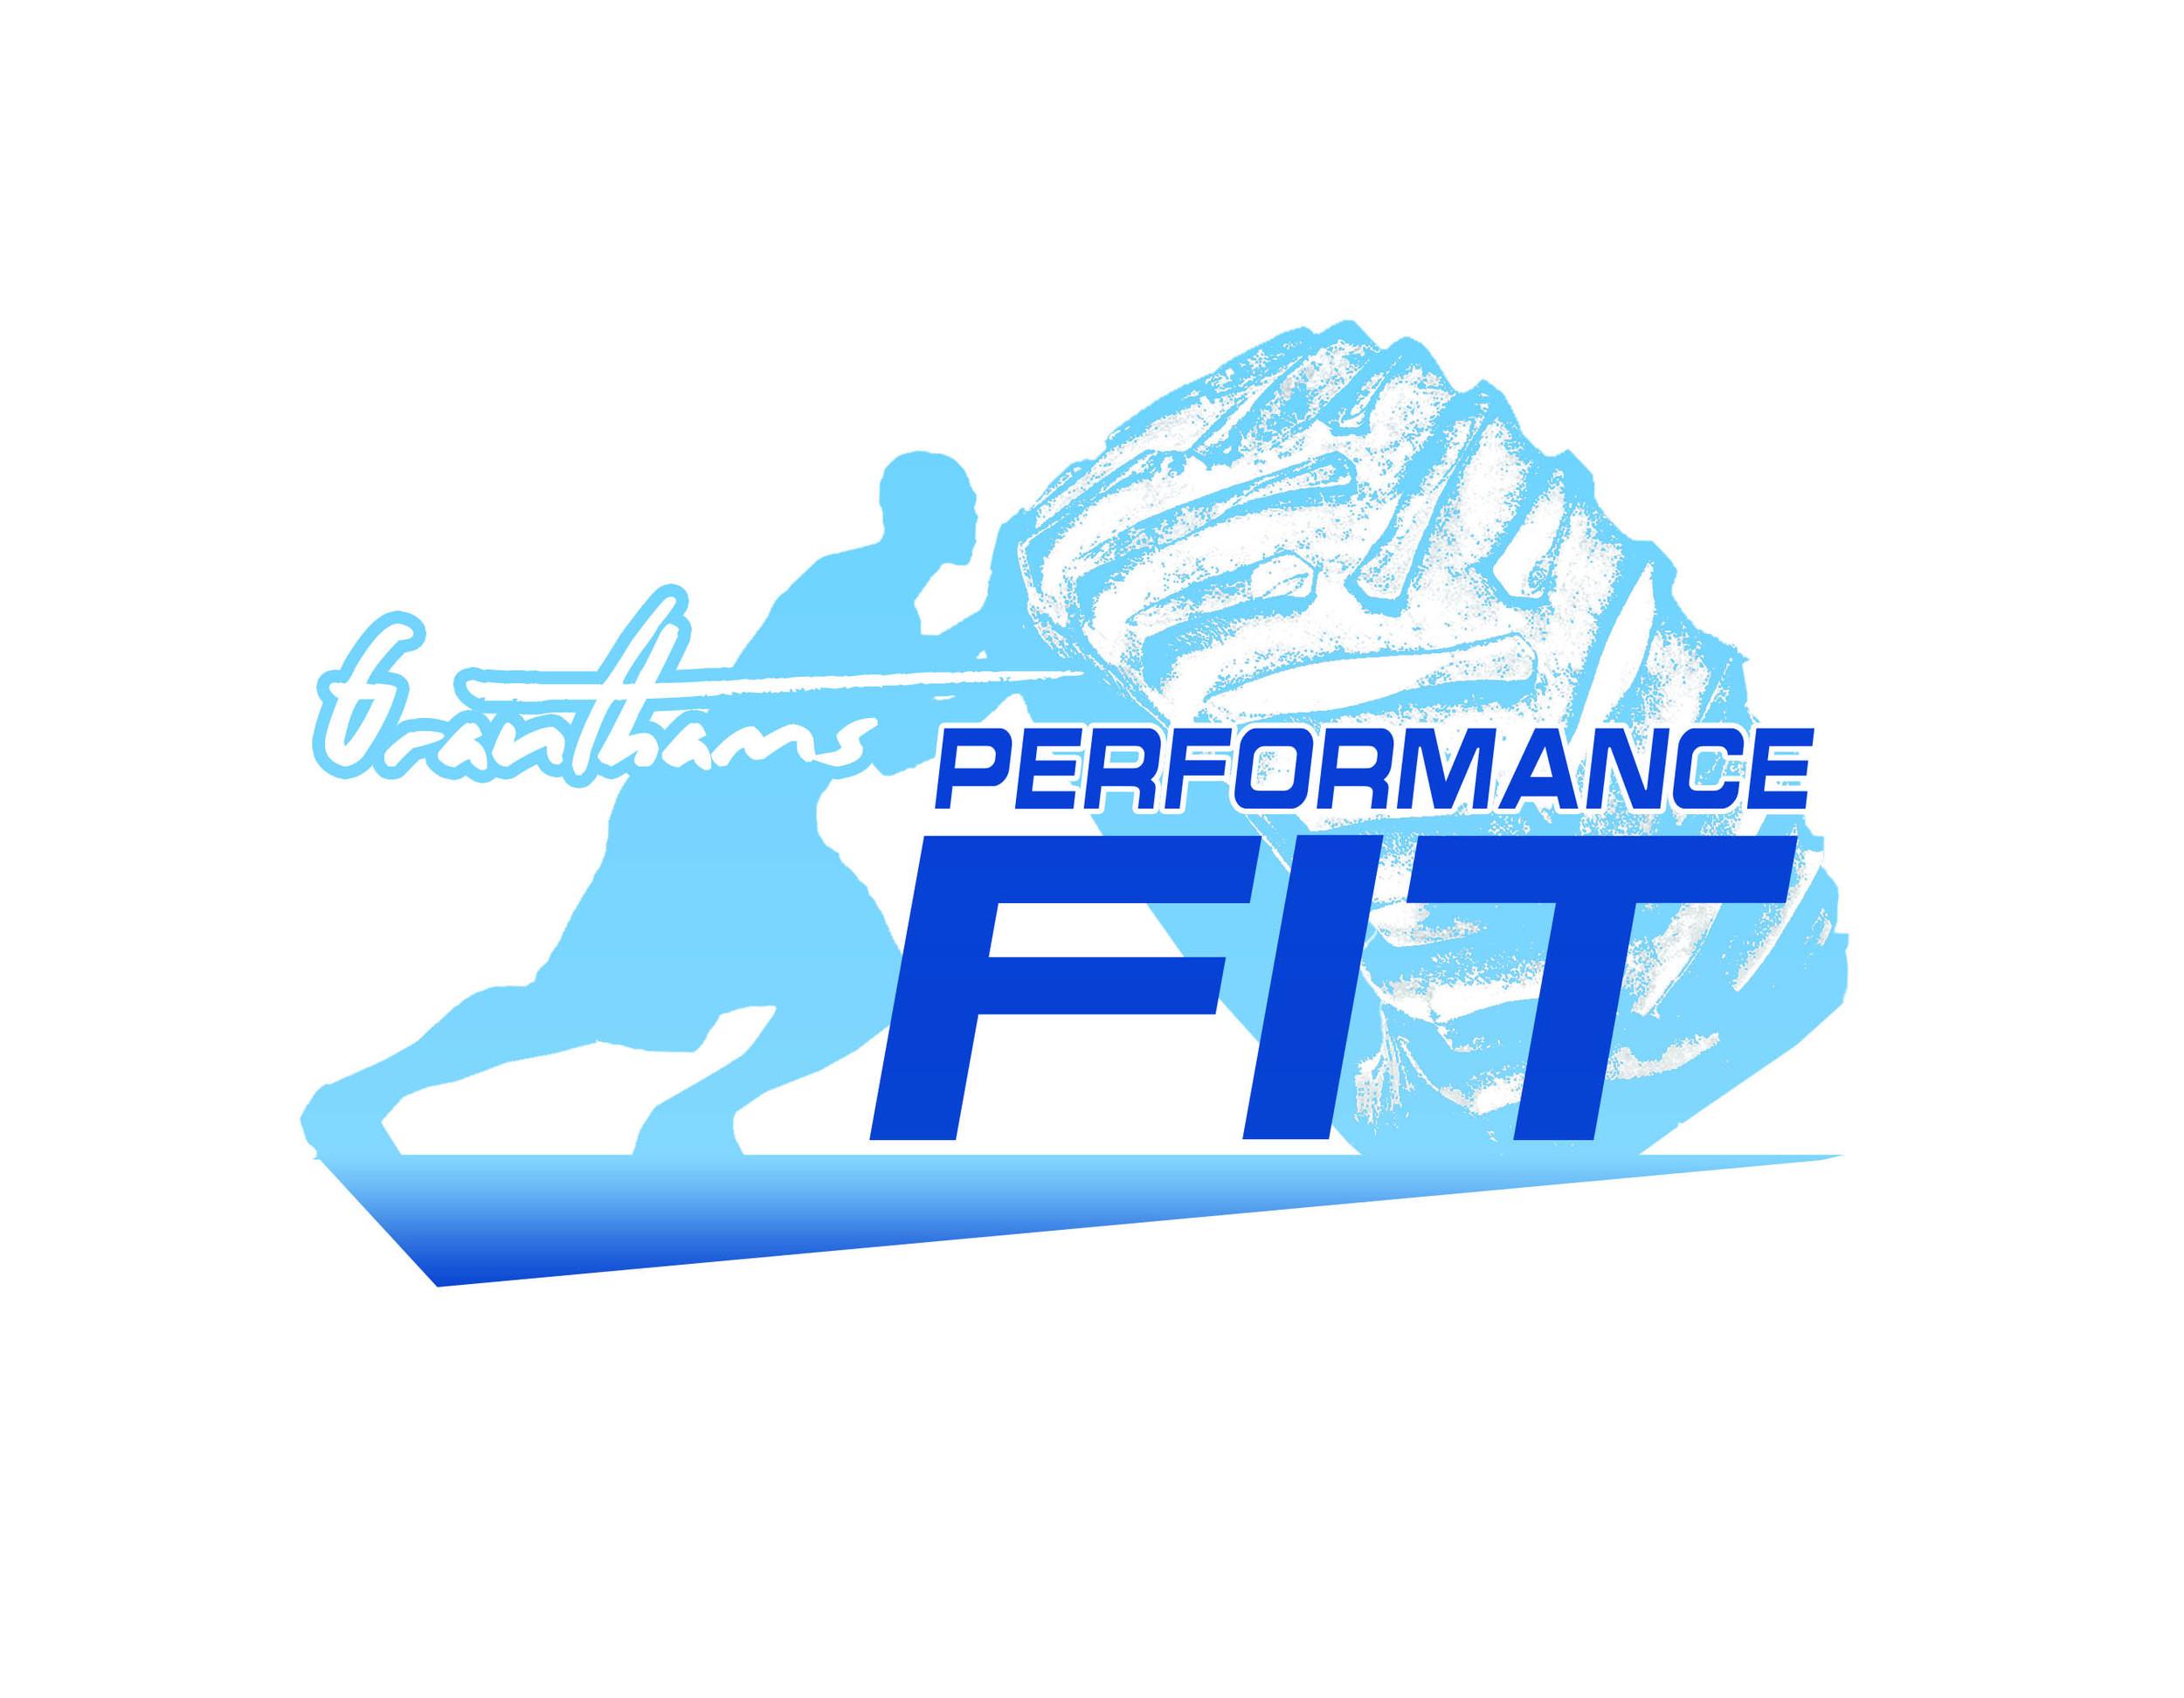 Logo design for Grantham's Performance FIT